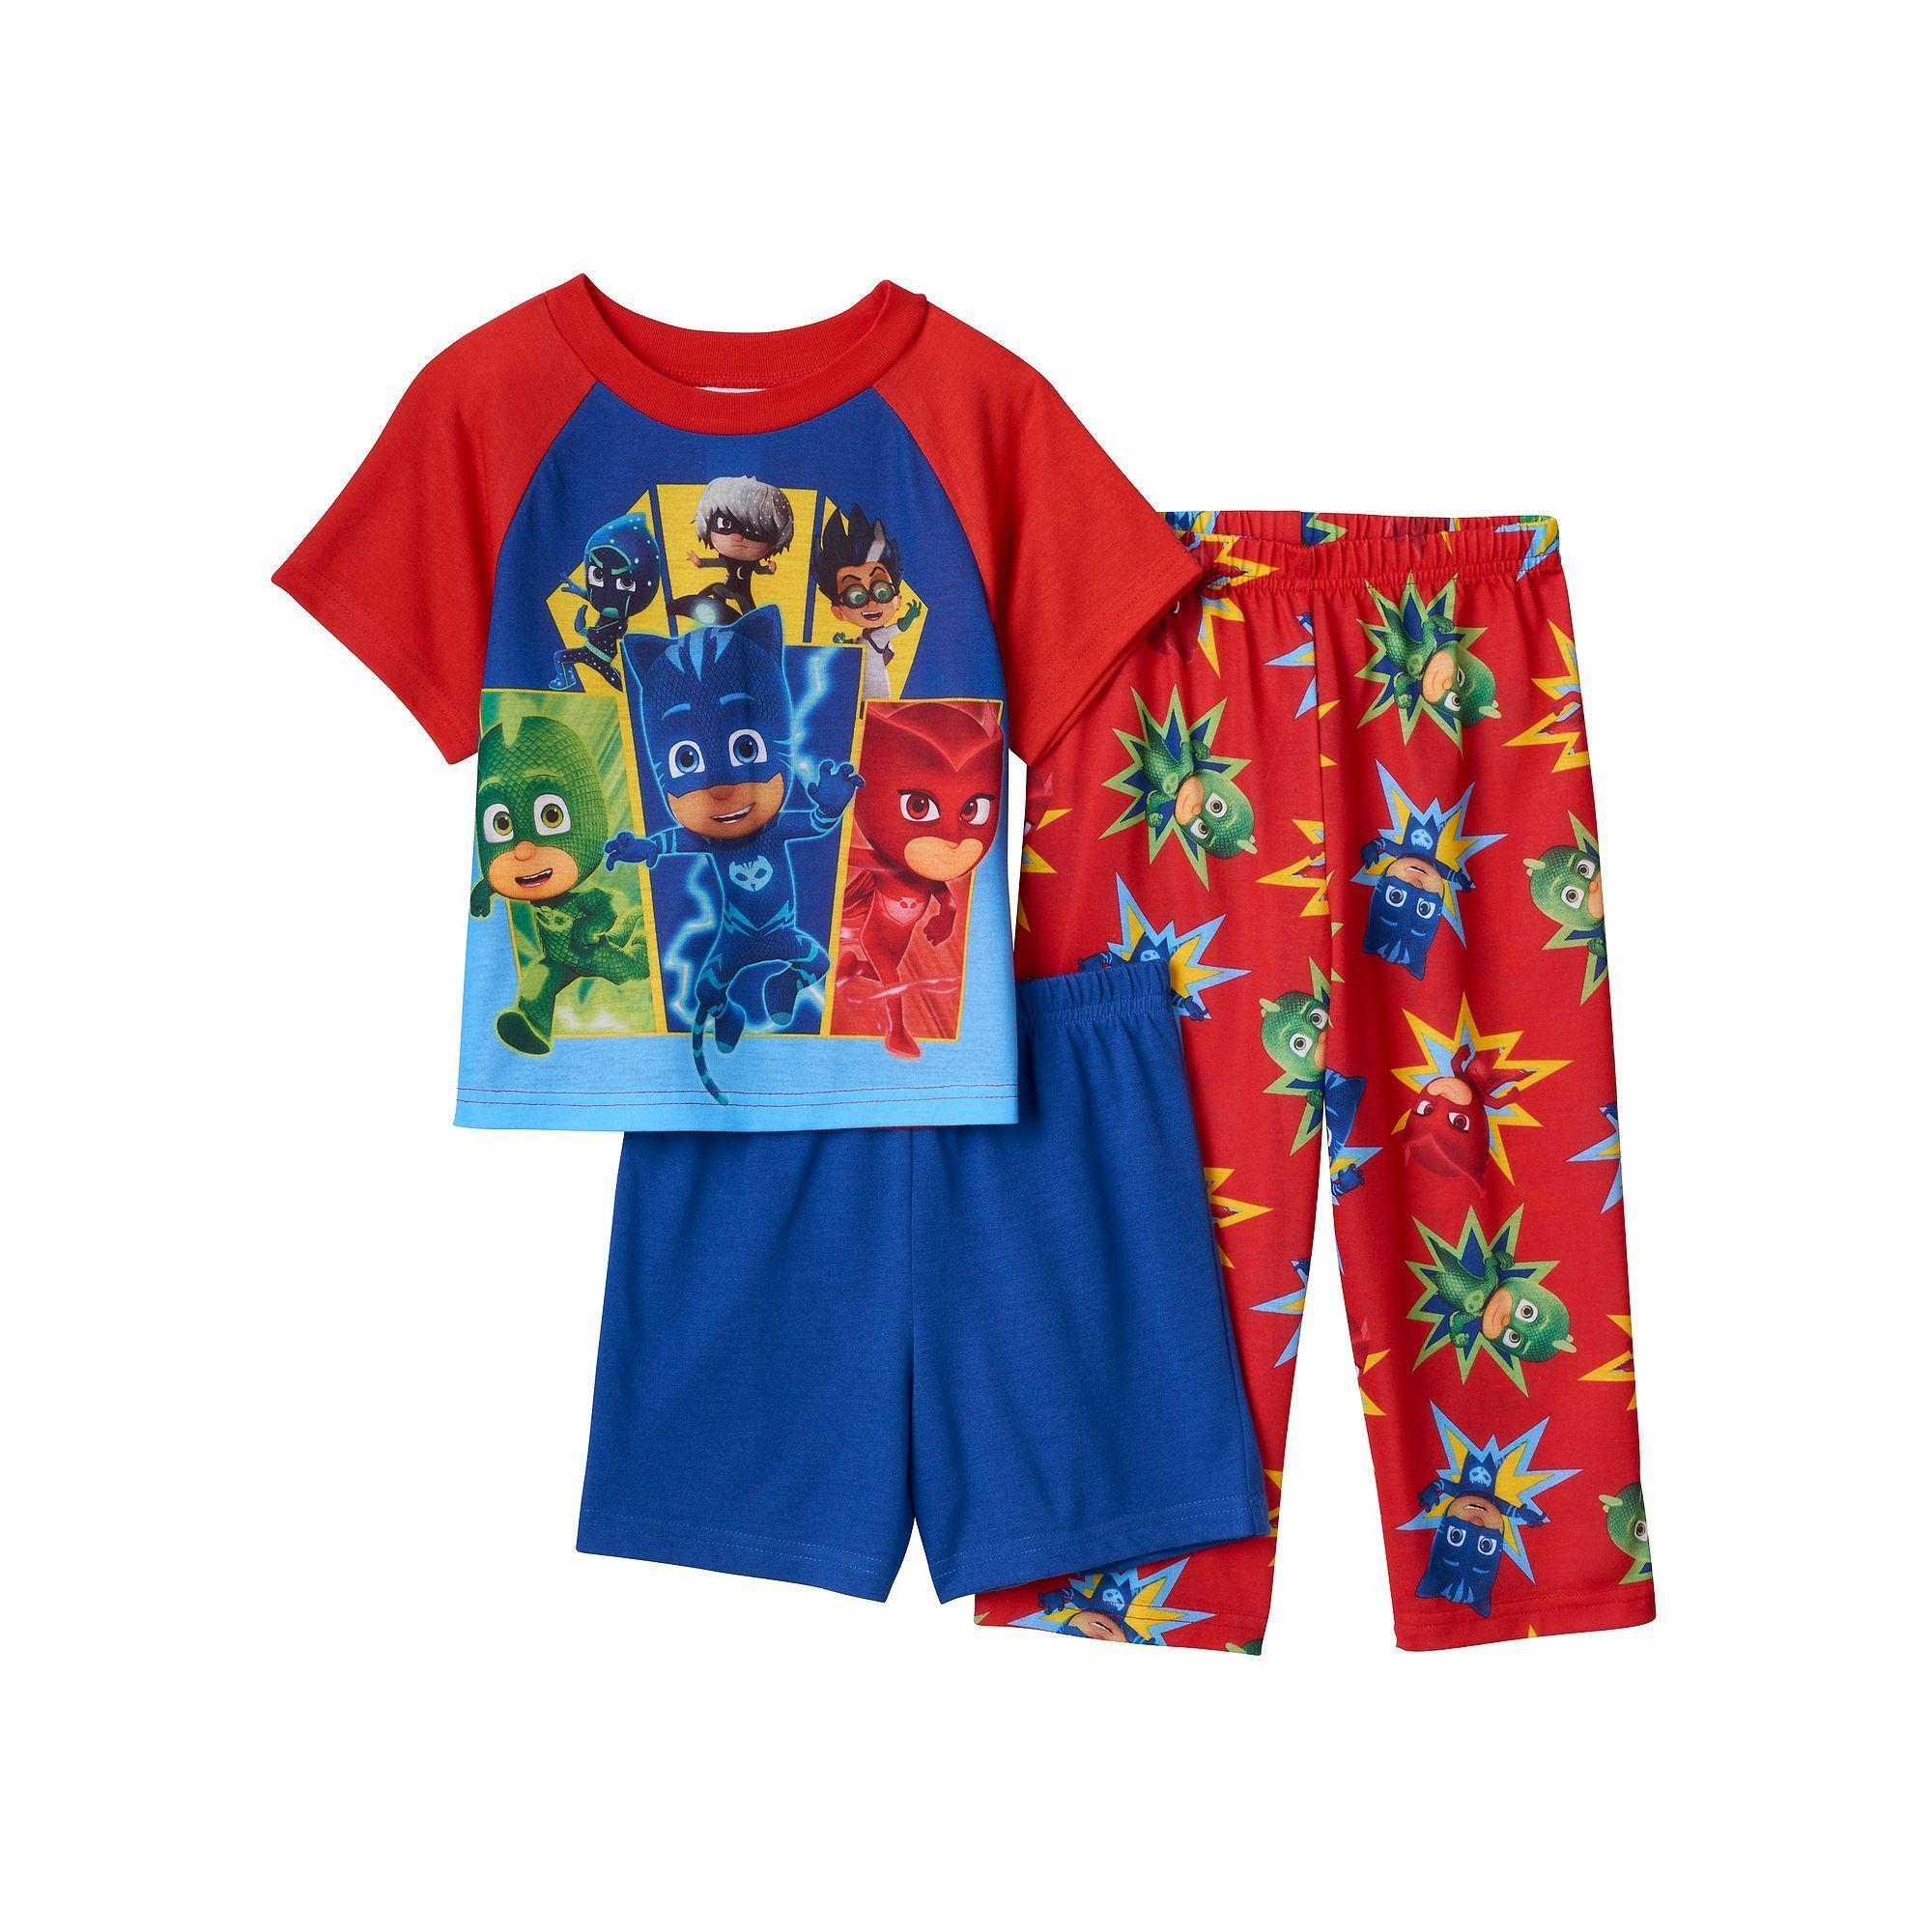 2d4840eee9ea Pj Masks Gekko Pajamas - Design Templates